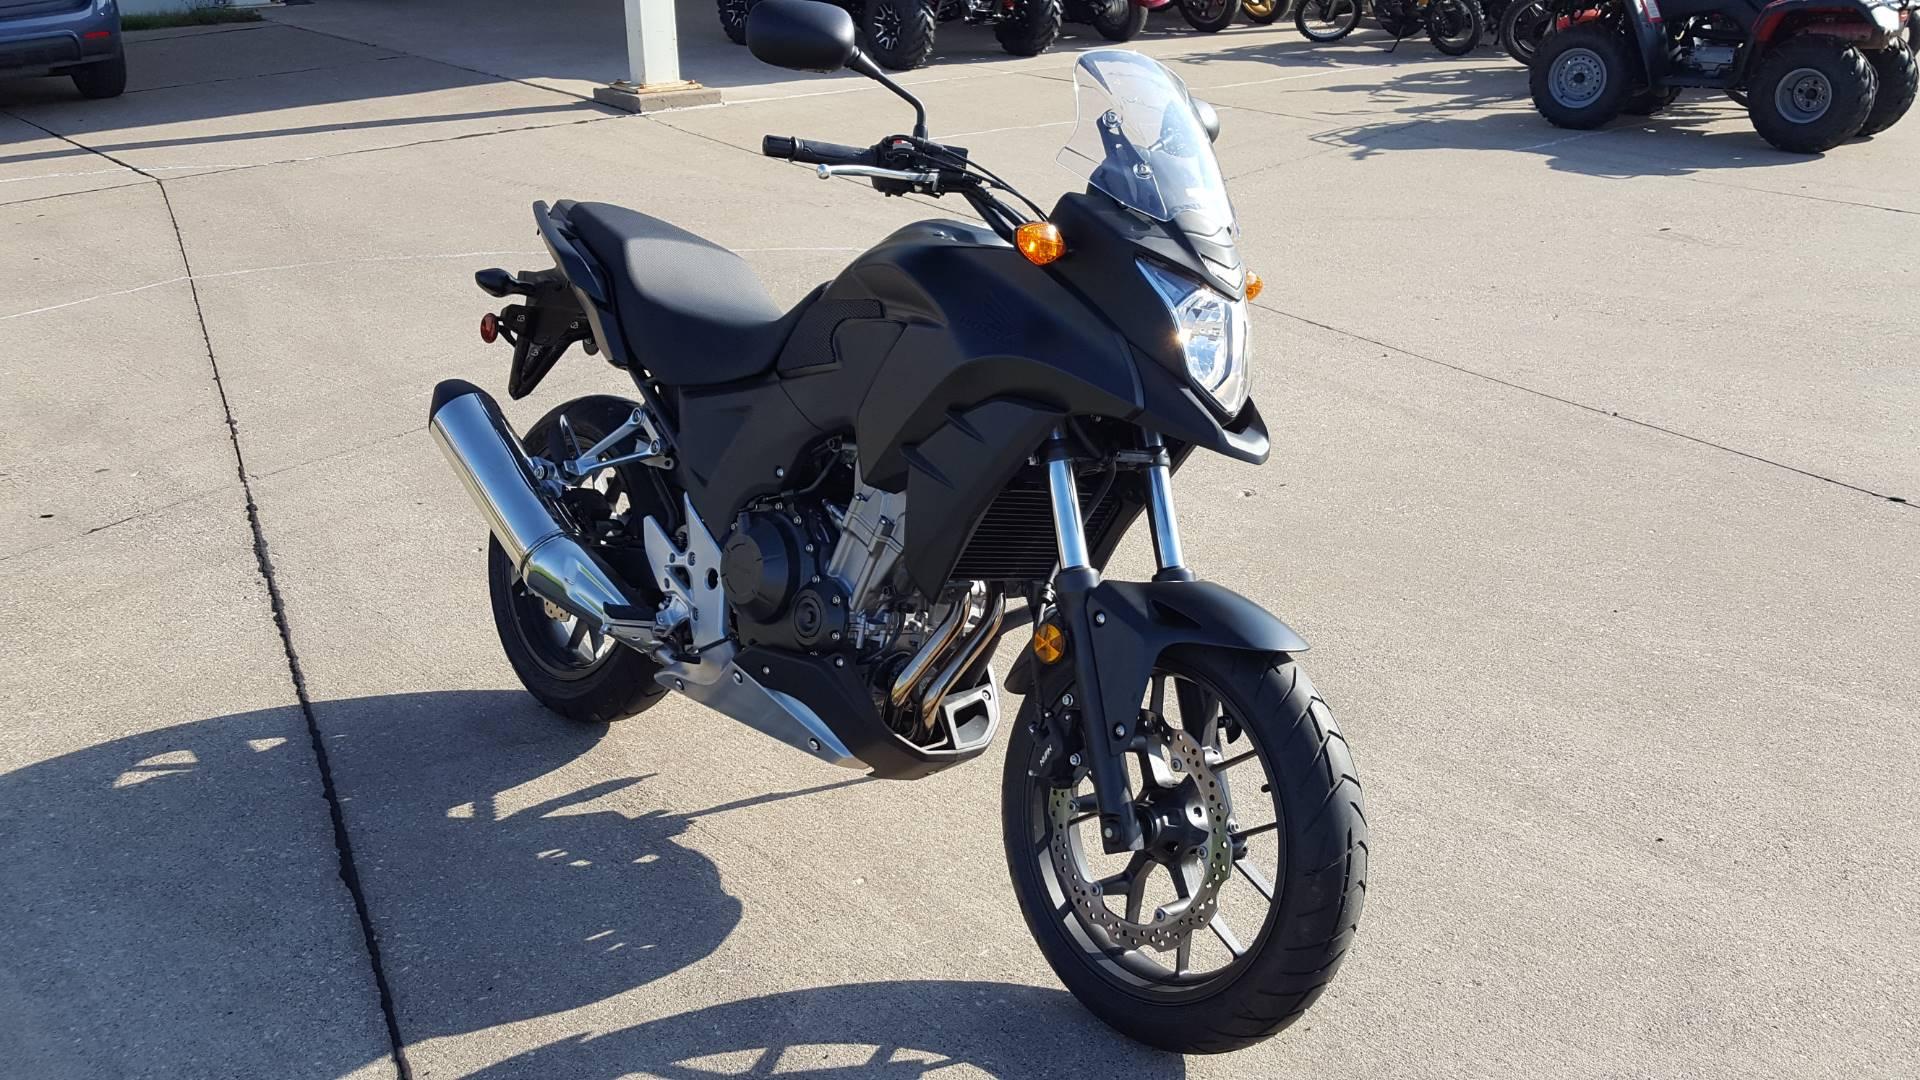 Used 2015 Honda CB500X Motorcycles in Davenport IA